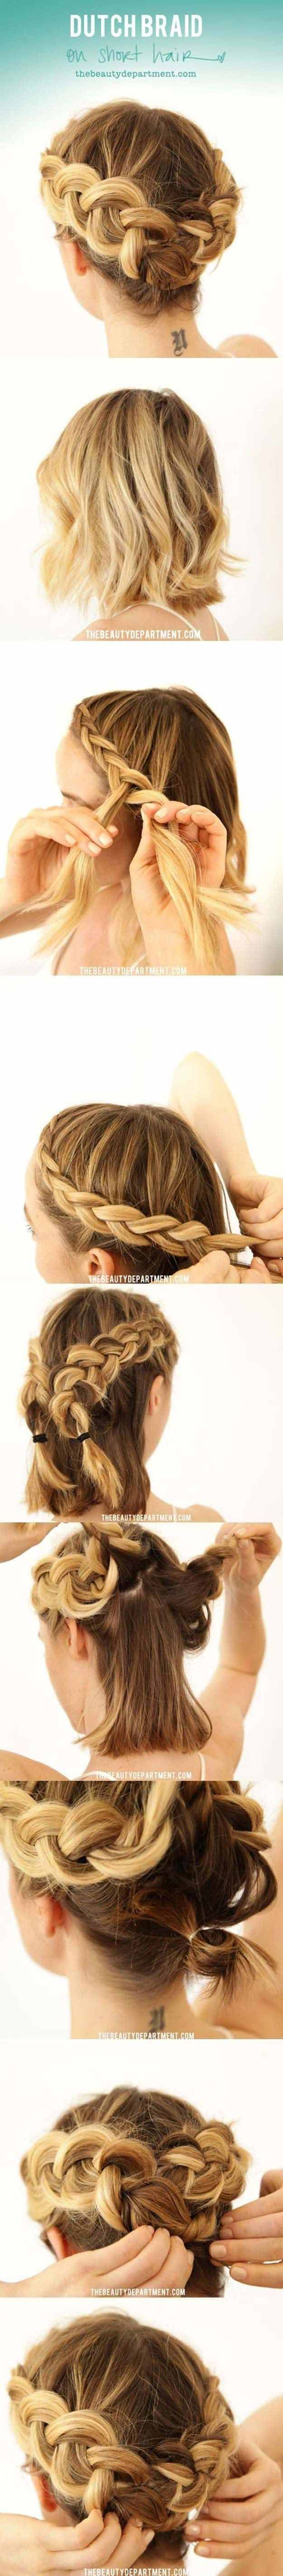 Festival hair tutorials summer braid short quick and easy